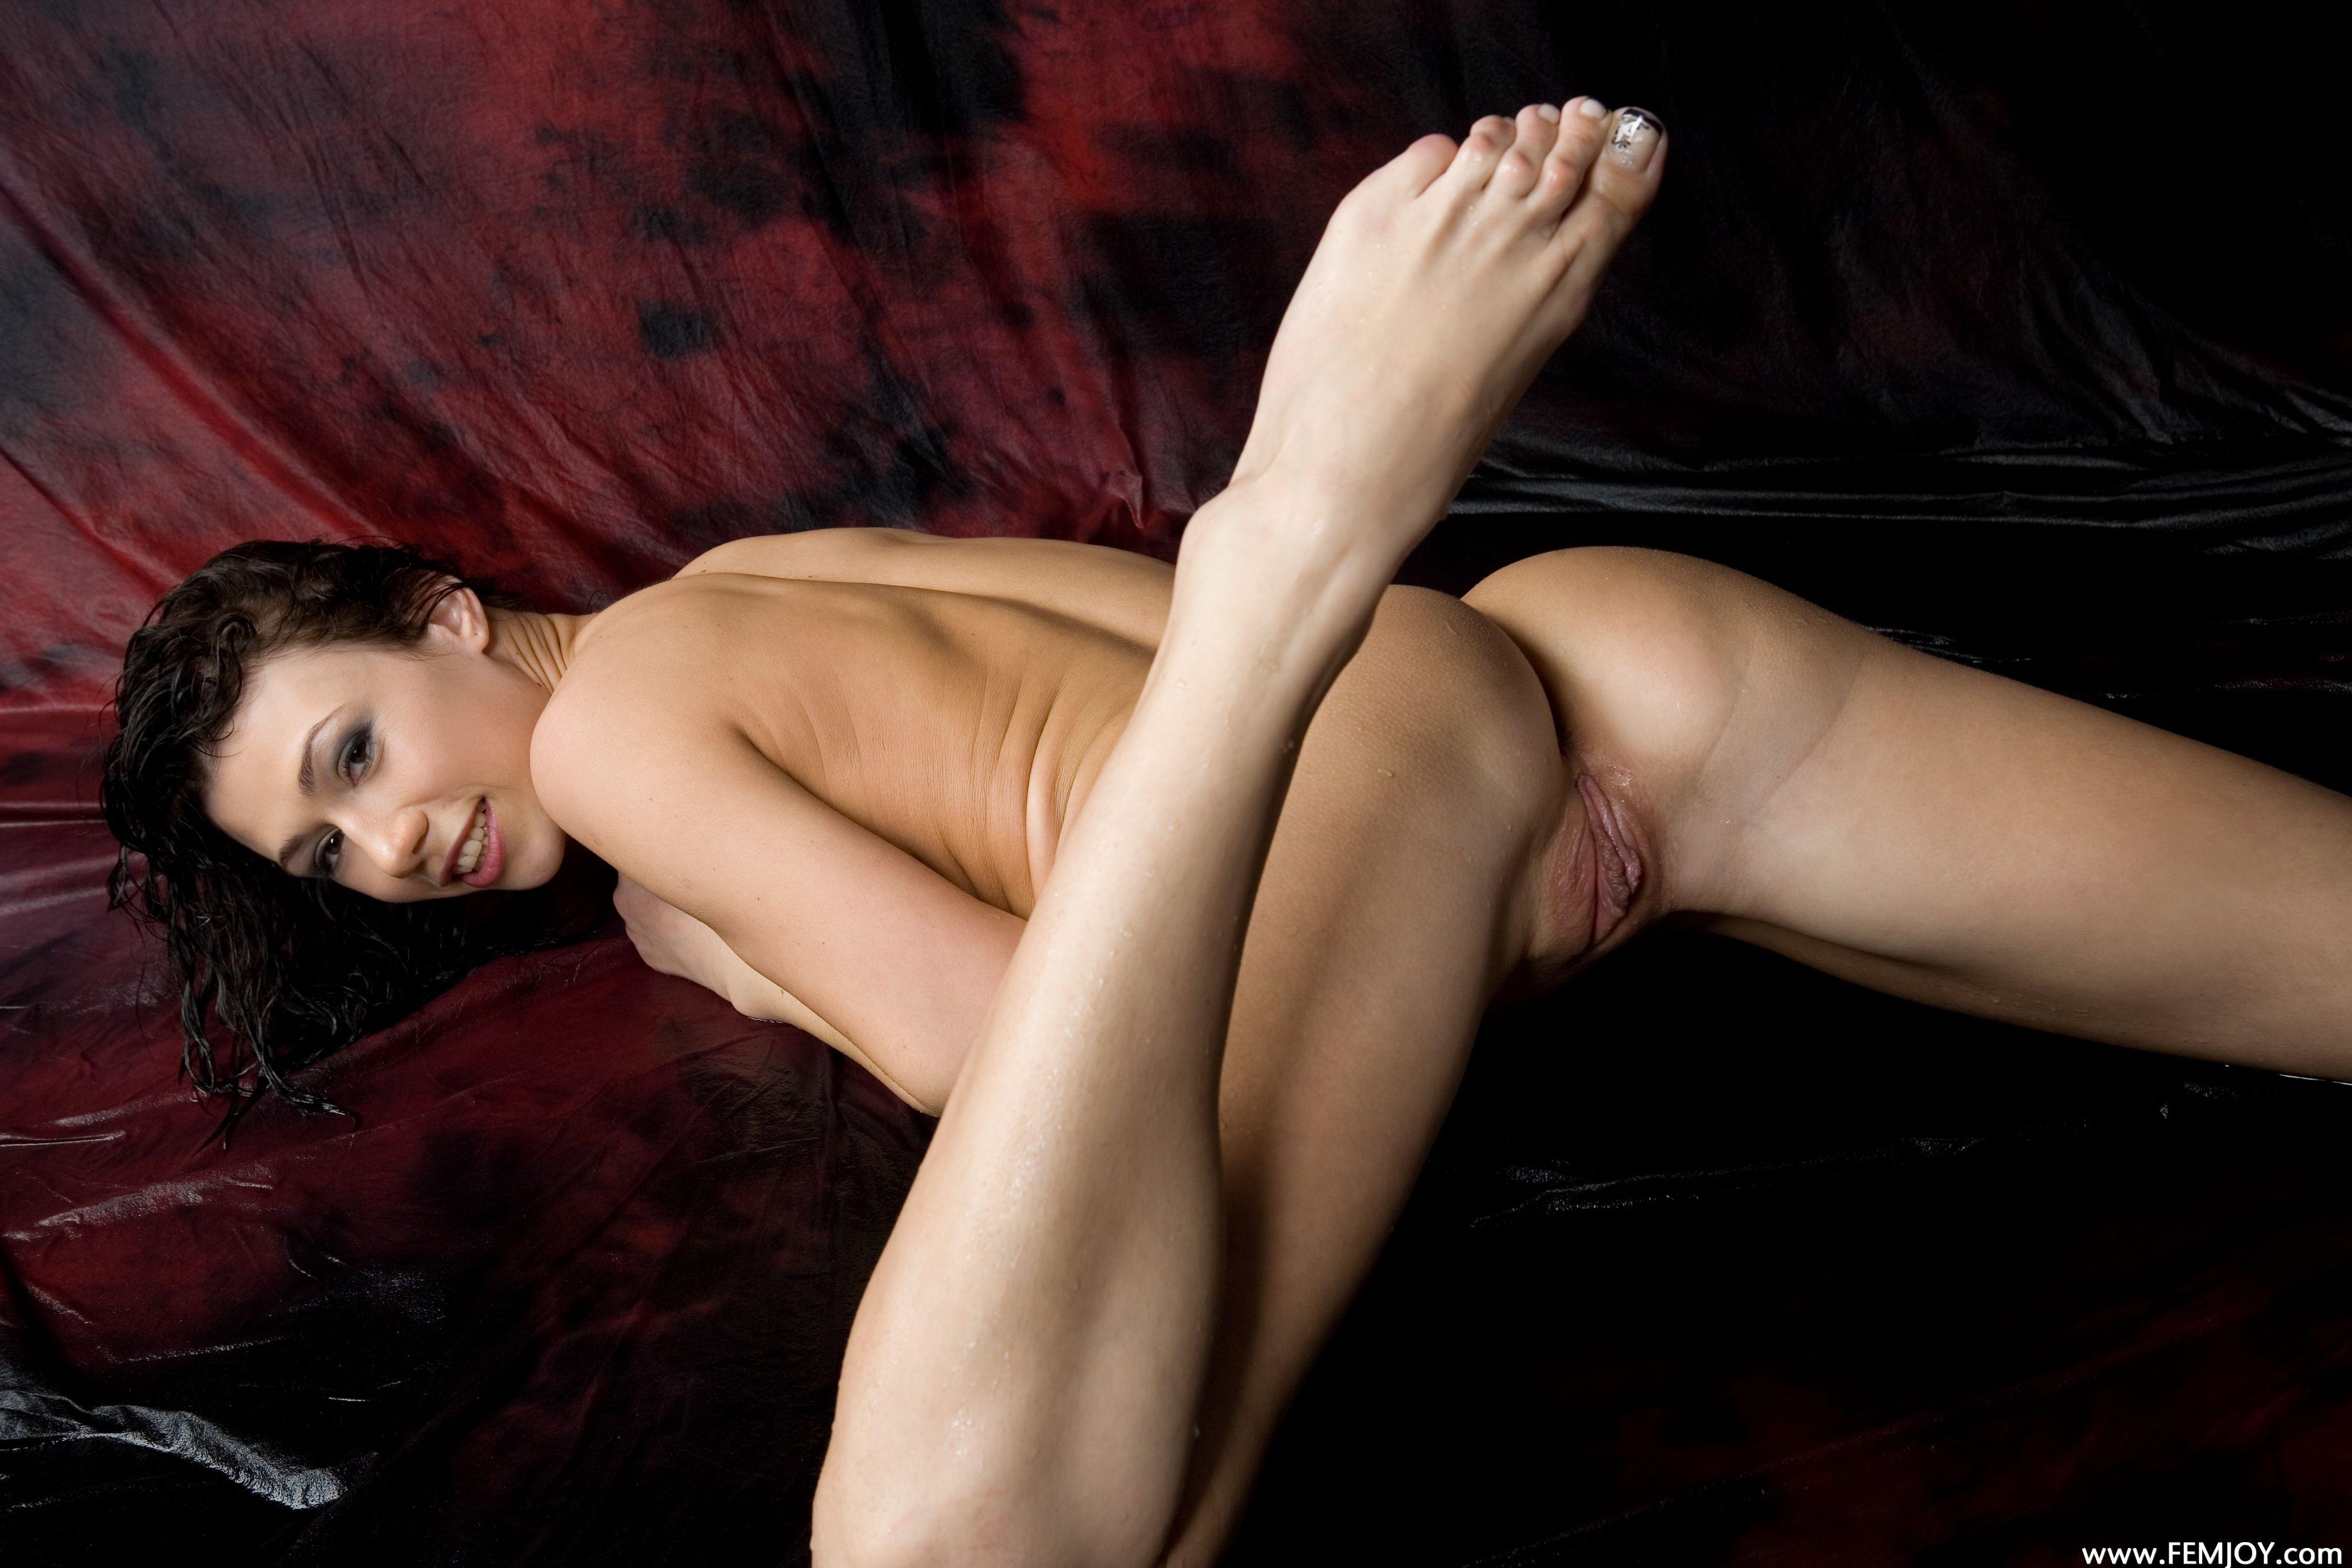 Nudeass